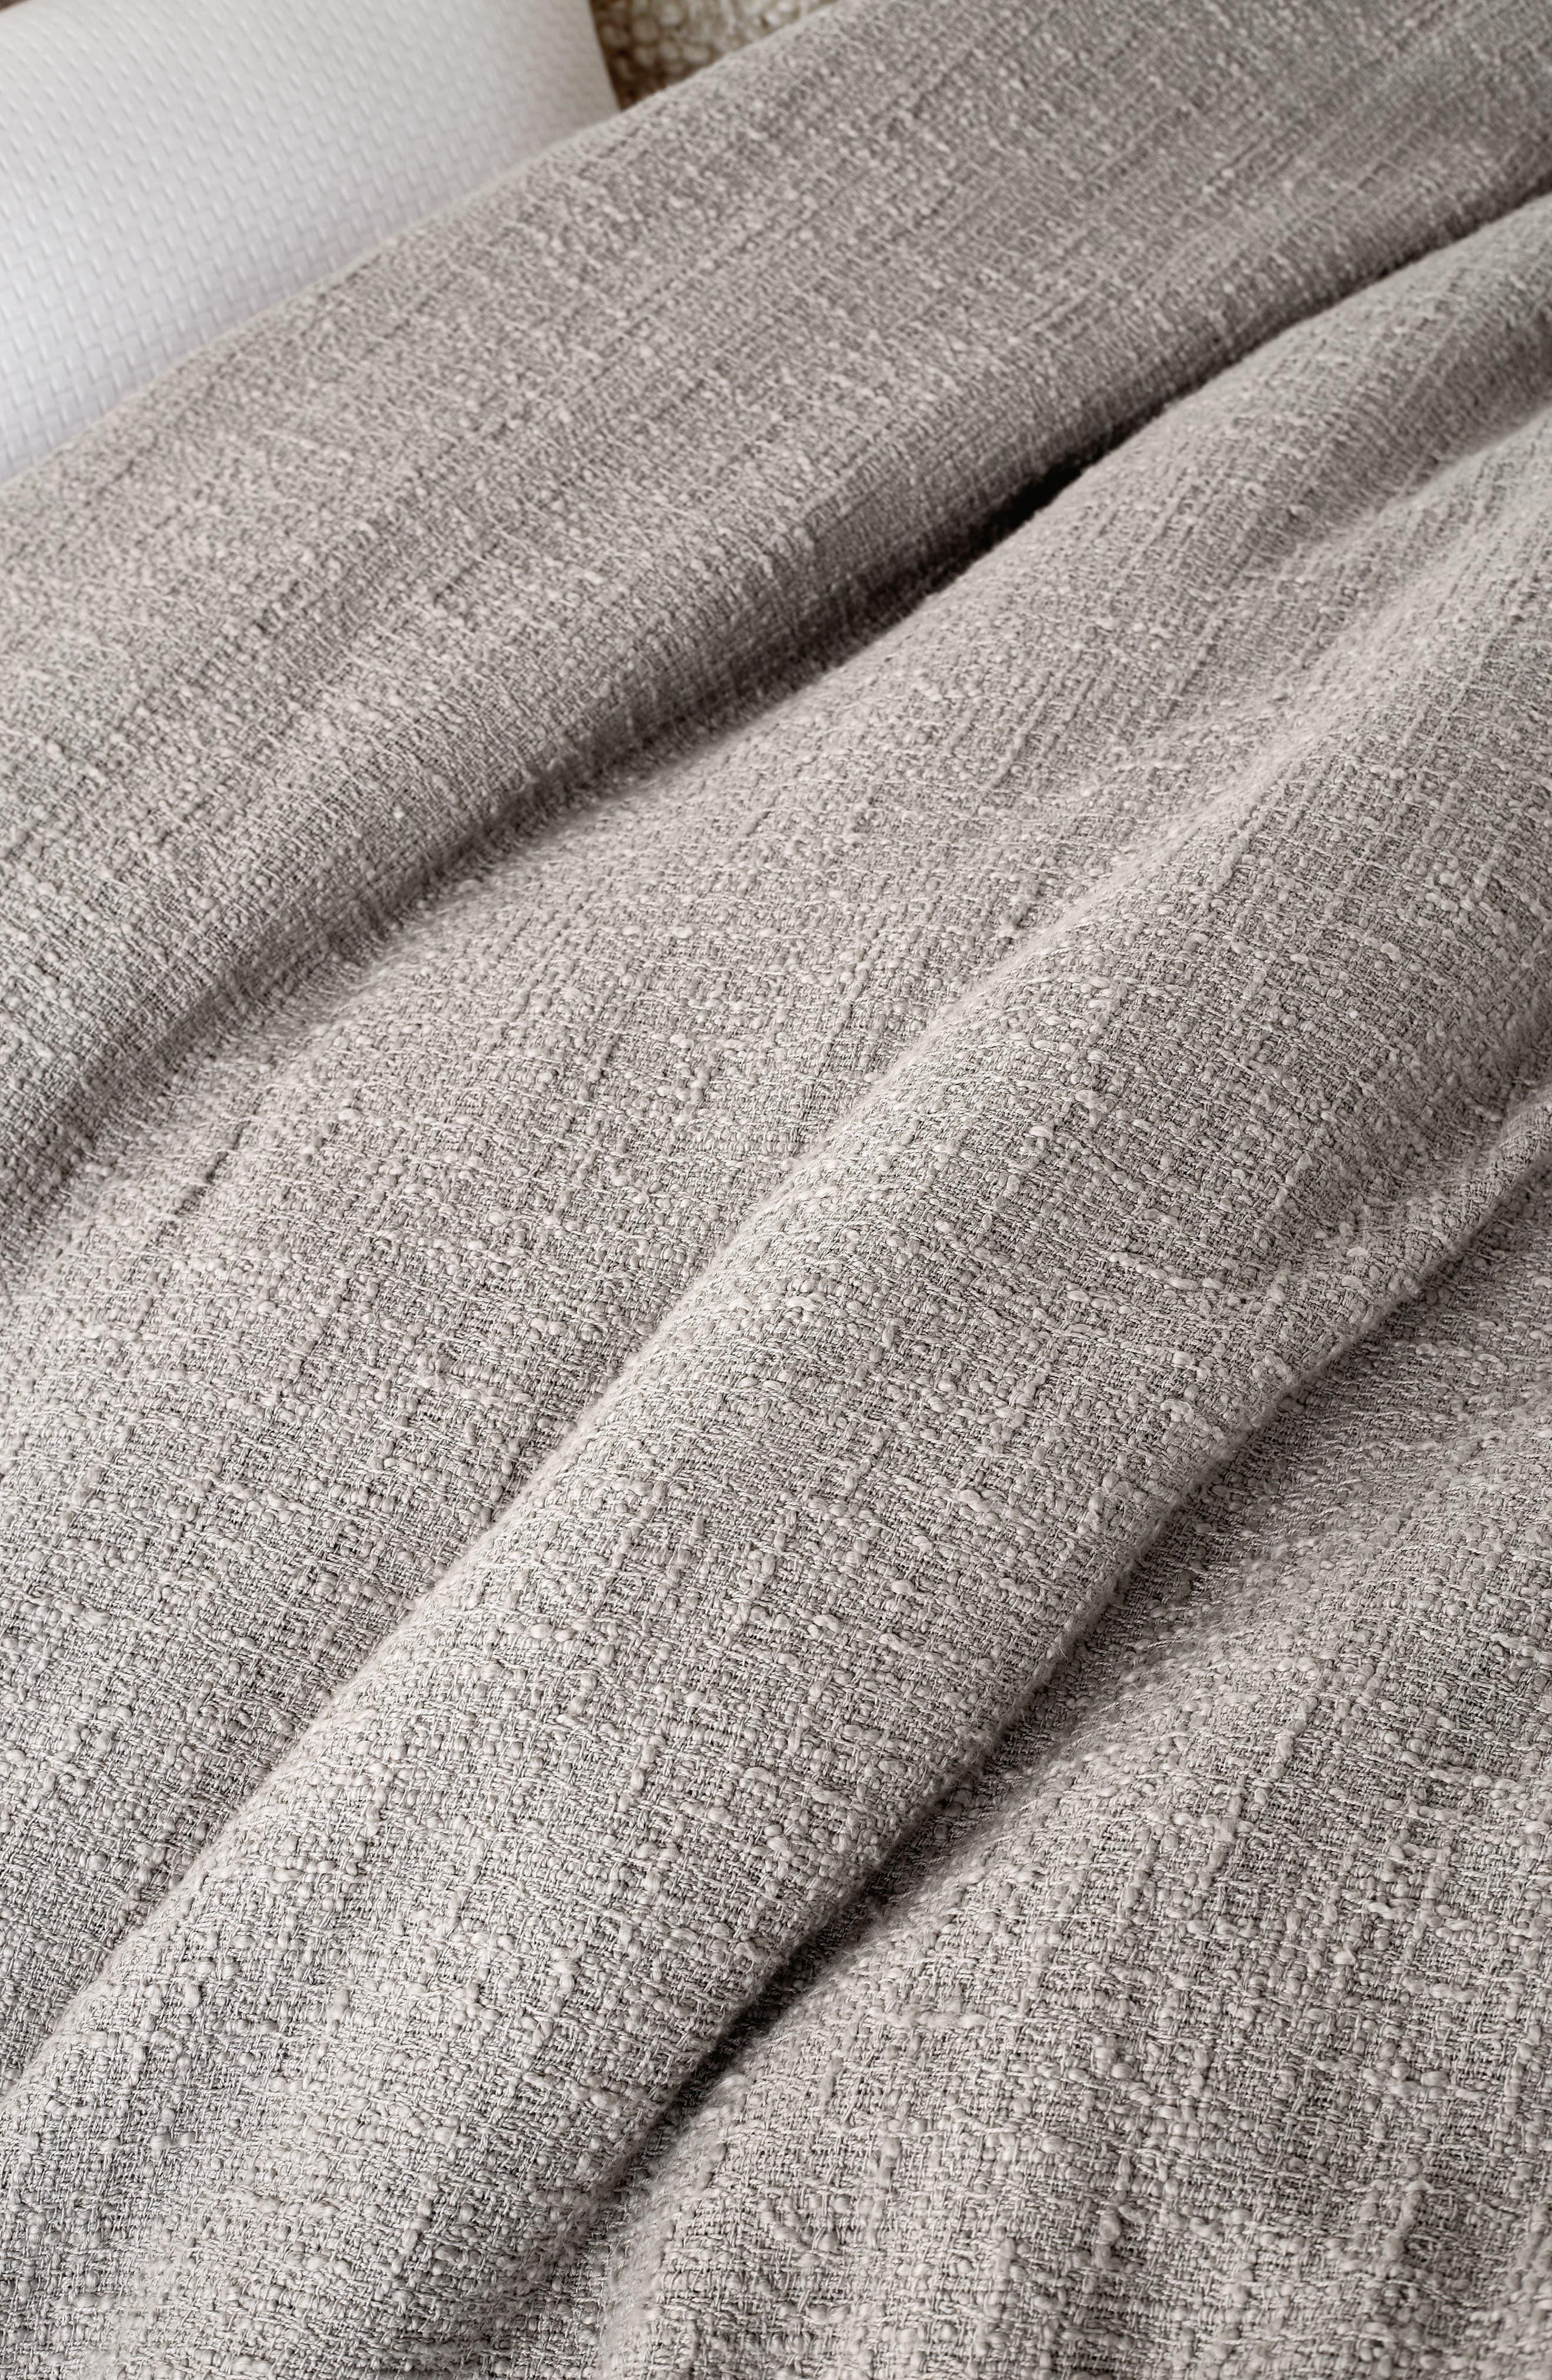 DKNY,                             Pure Texture Duvet Cover,                             Alternate thumbnail 2, color,                             GREY